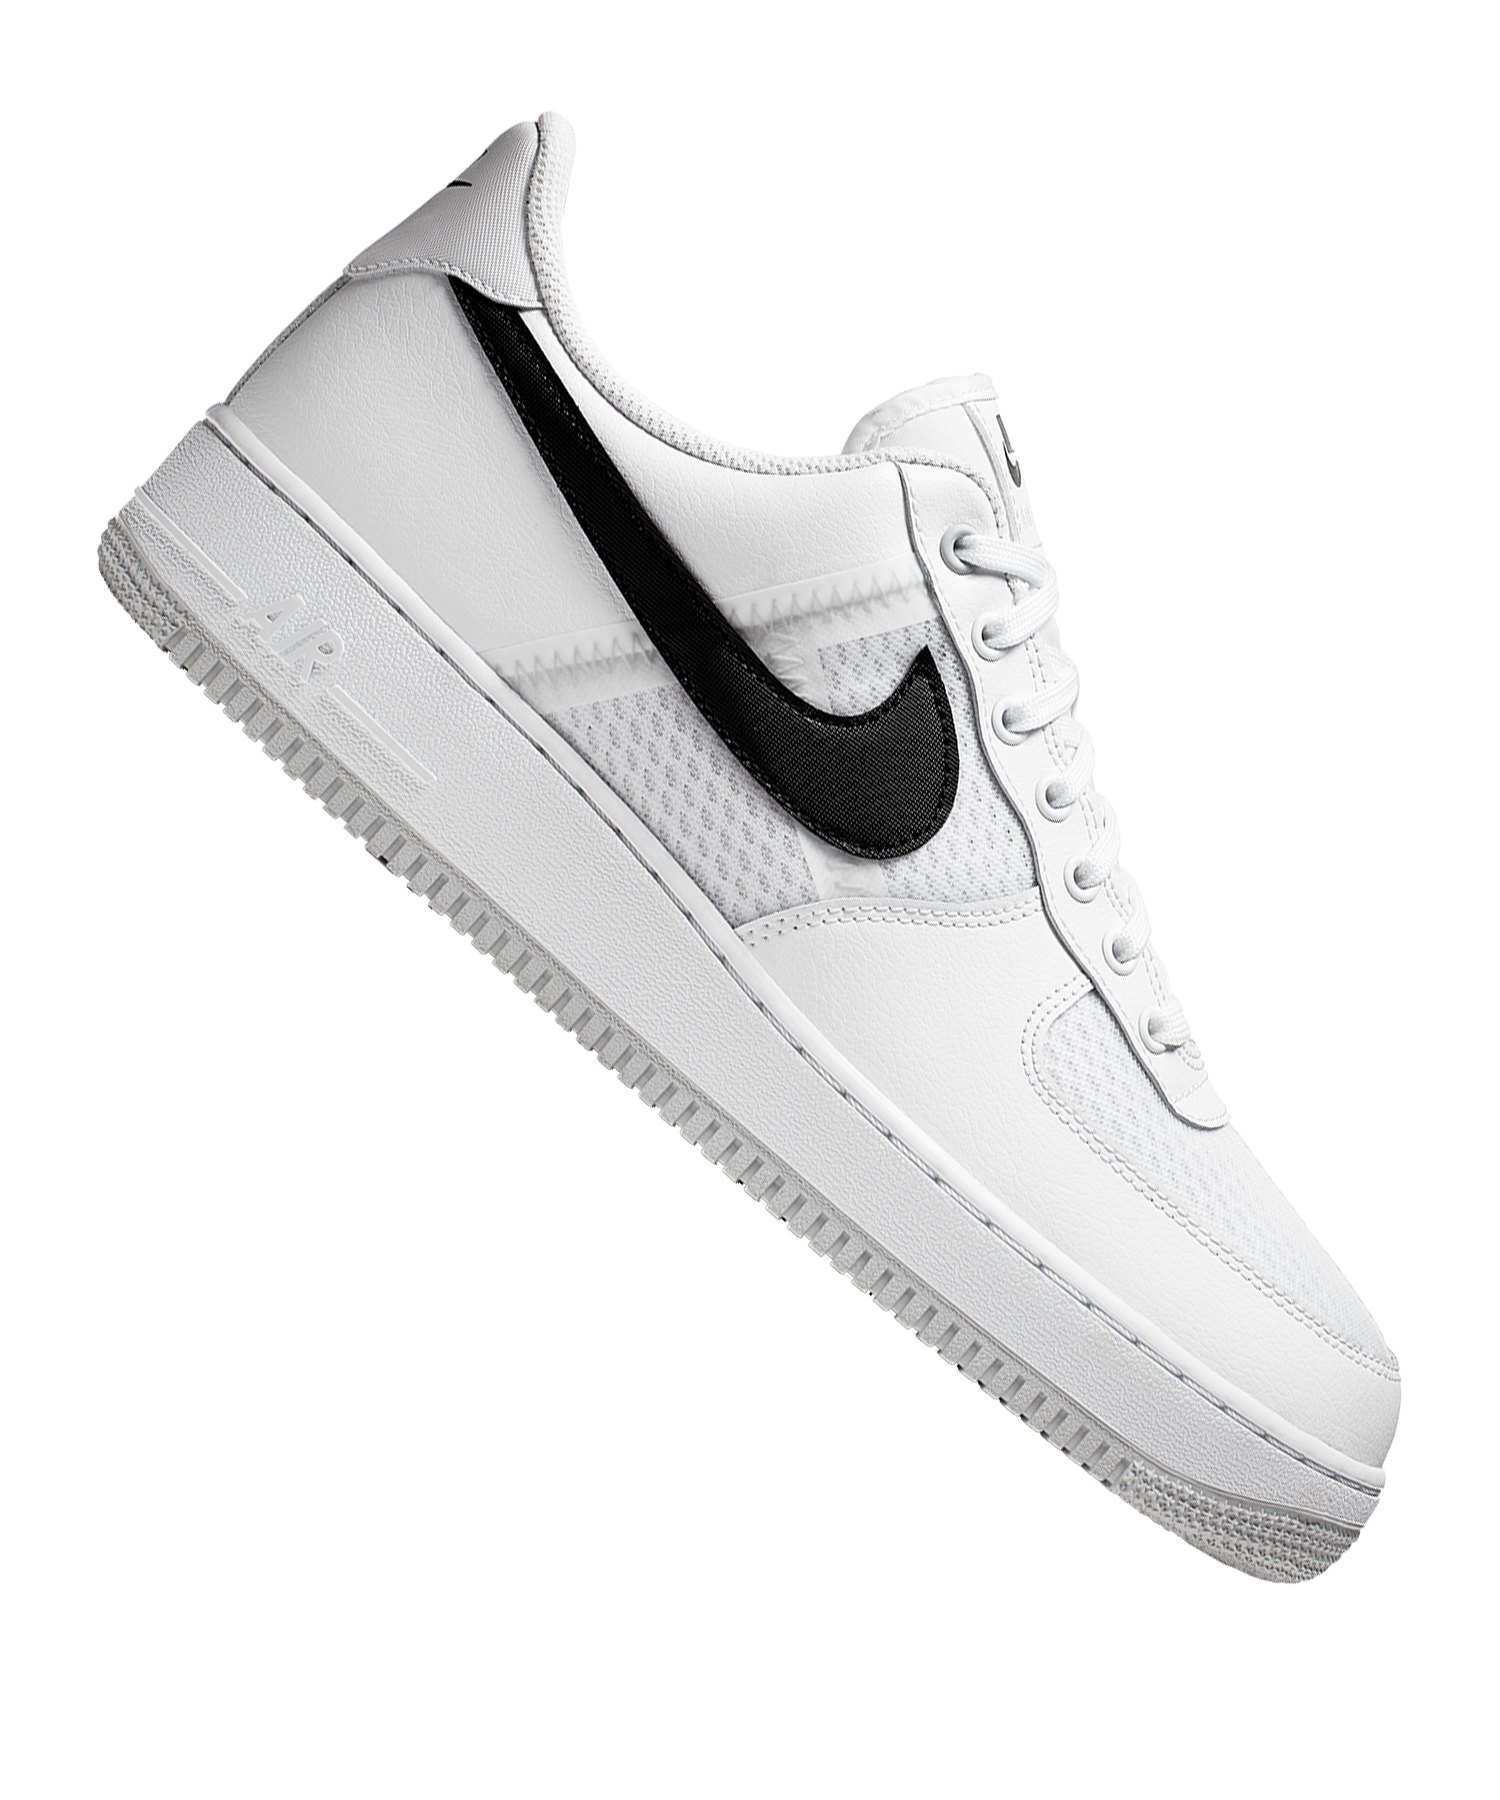 Nike Air Force 1 07 Lv8 1 Sneaker Weiss Schwarz F100